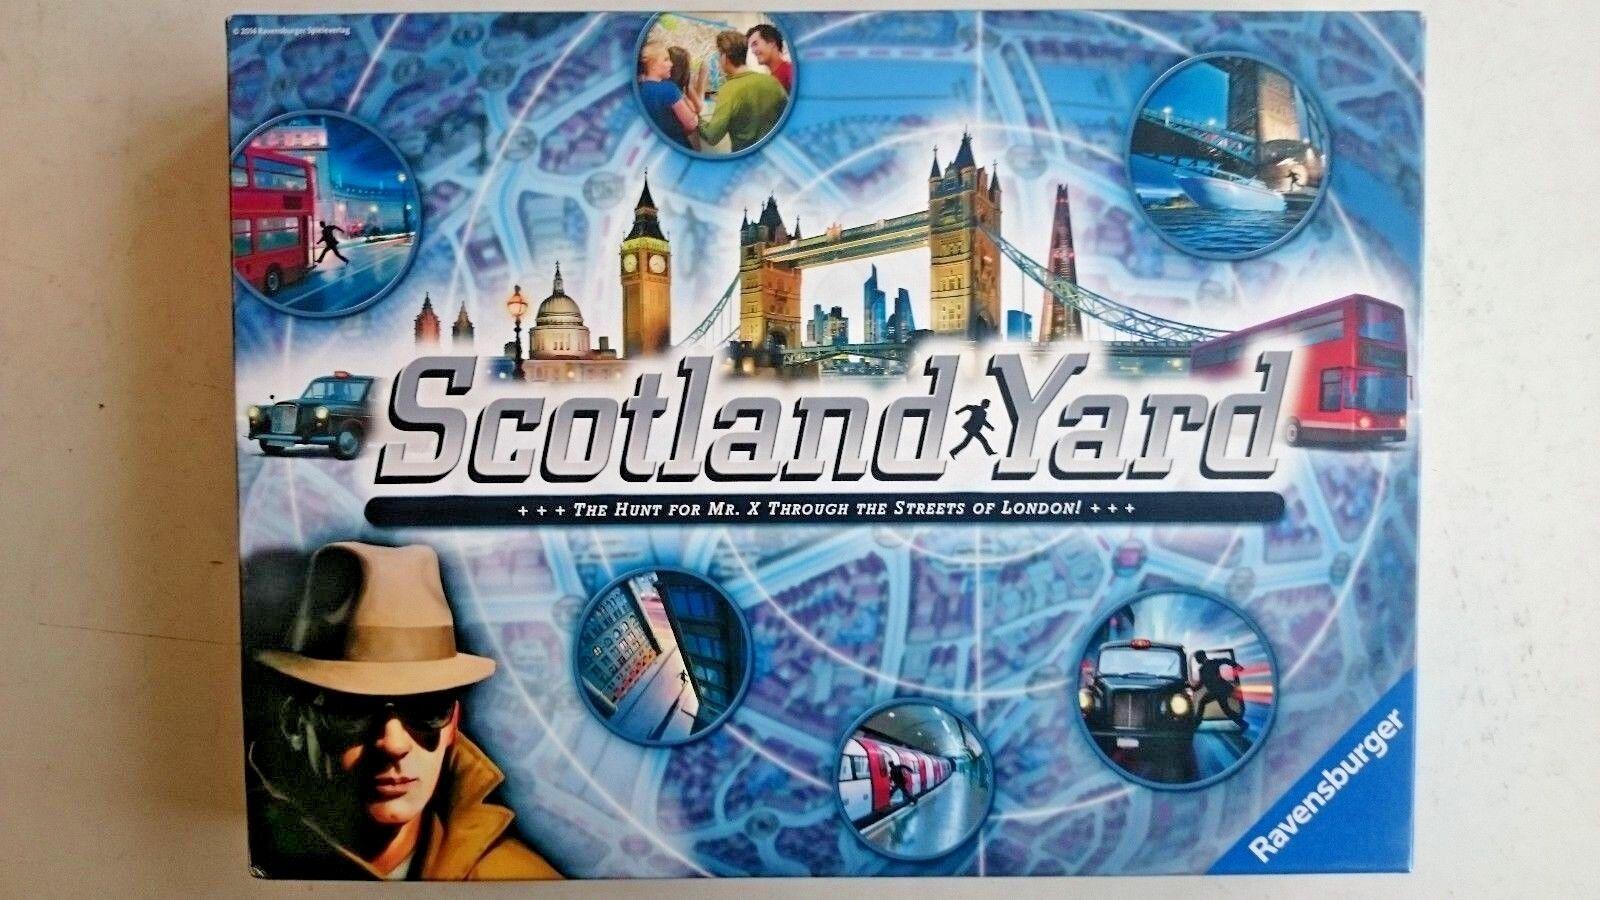 Scotland Yard Game ..By Ravensburger Games 2014 (New Unplayed)